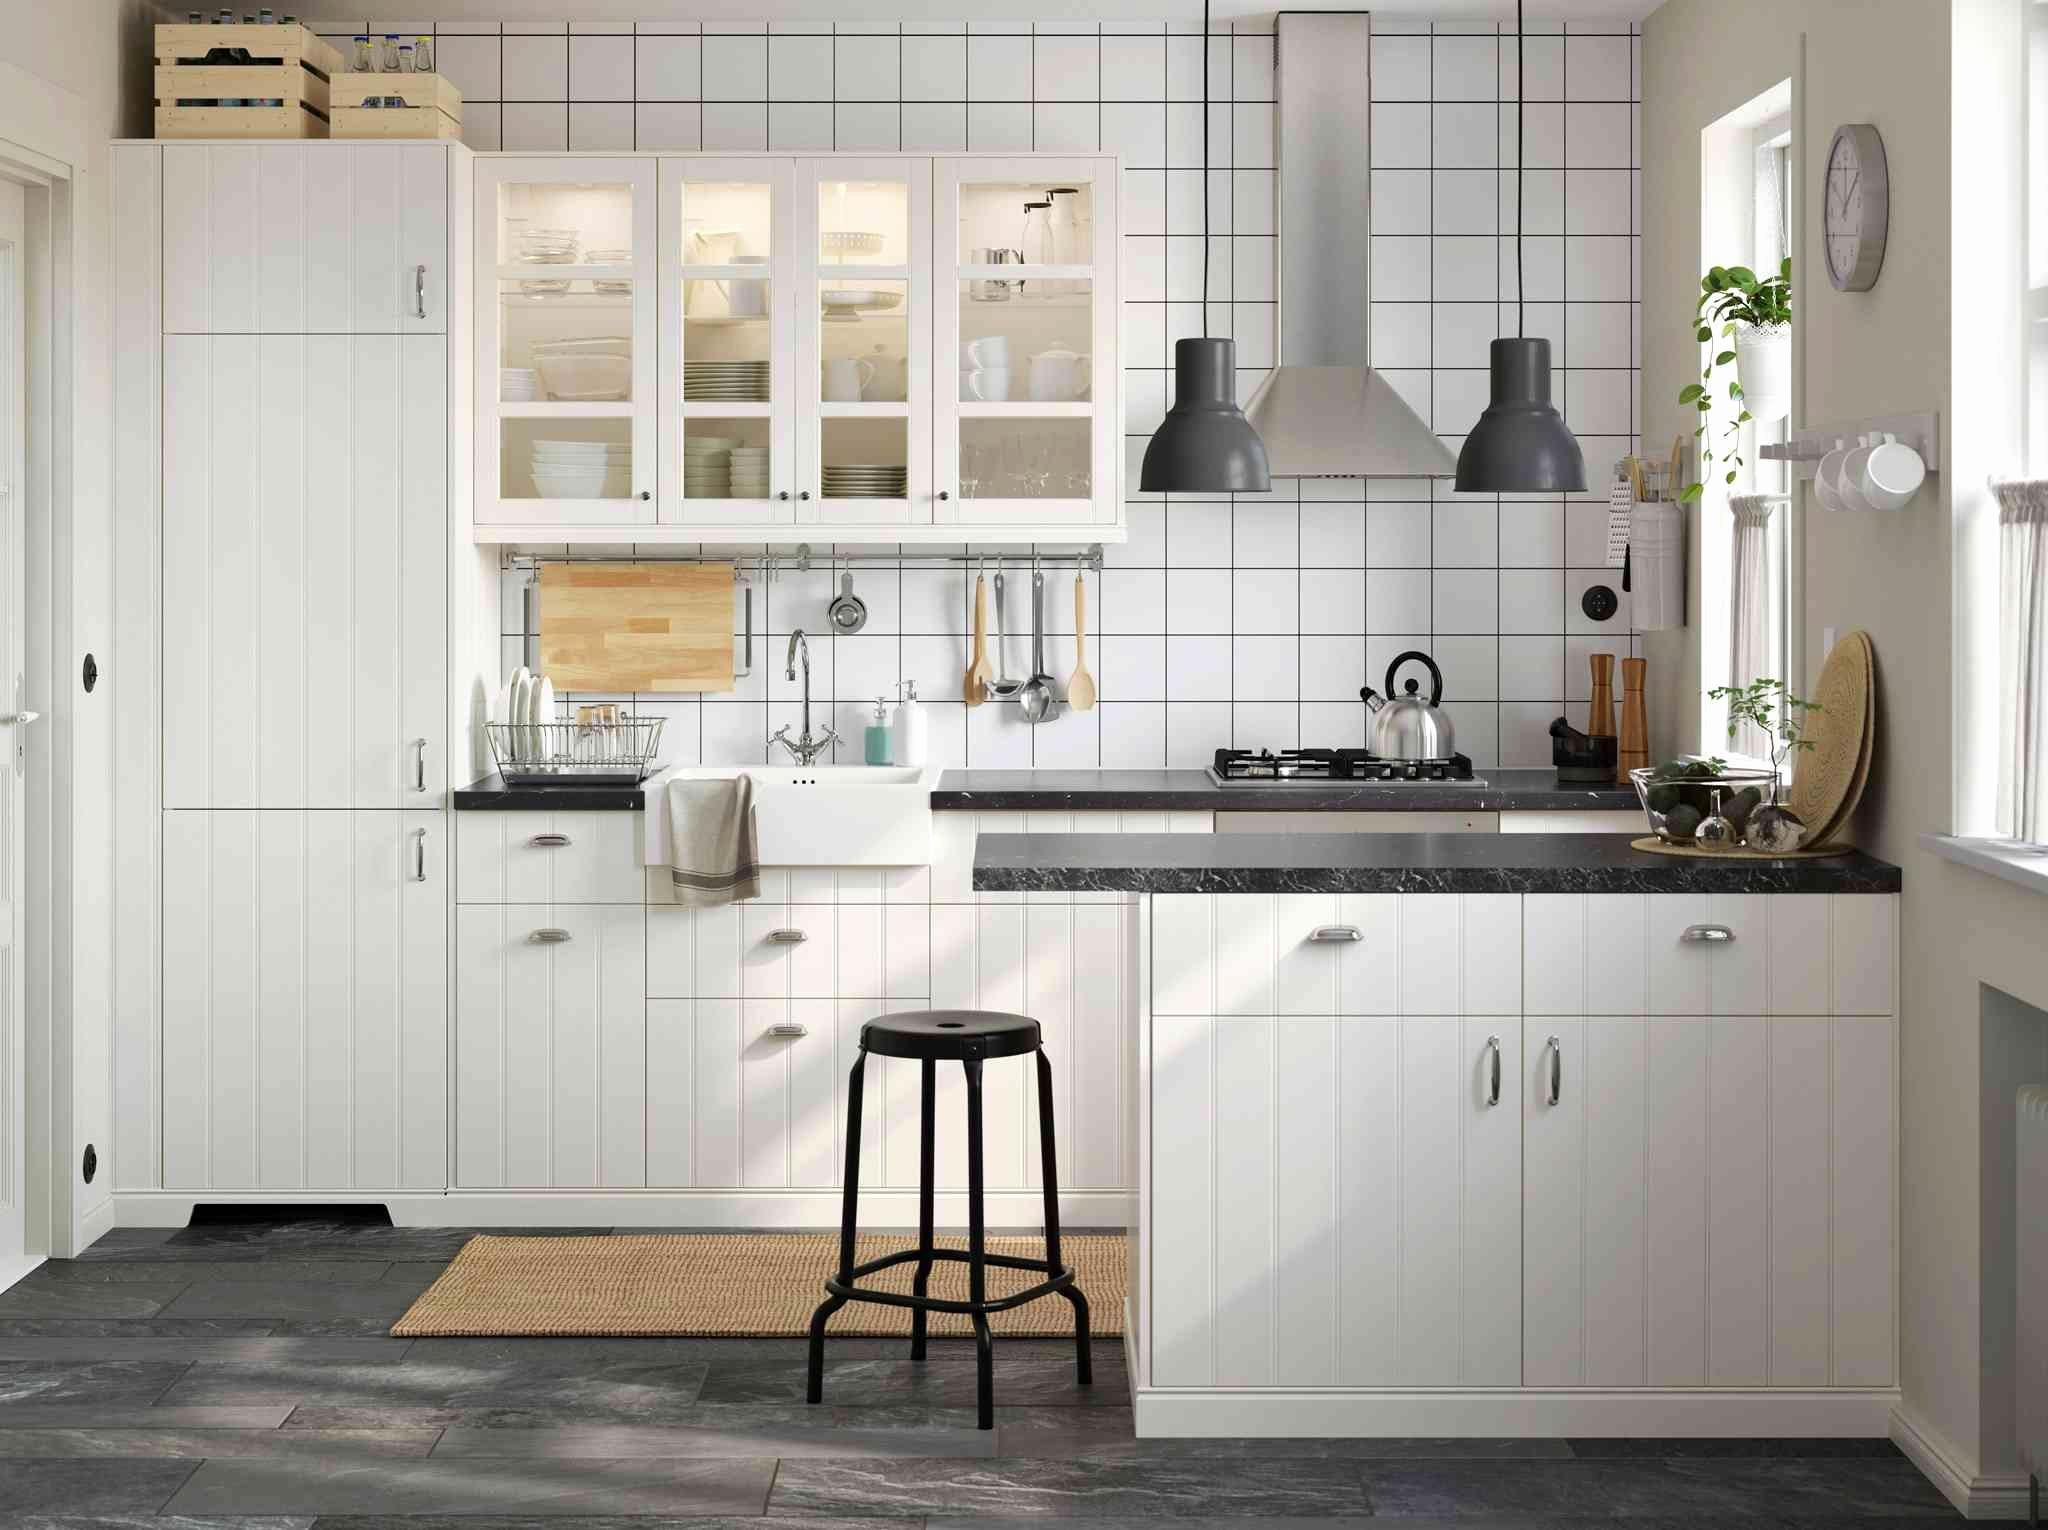 Devis En Ligne Ikea Luxe Images 50 Liste De Ikea Devis Cuisine élégant Devis Cuisine Ikea tocgiafo